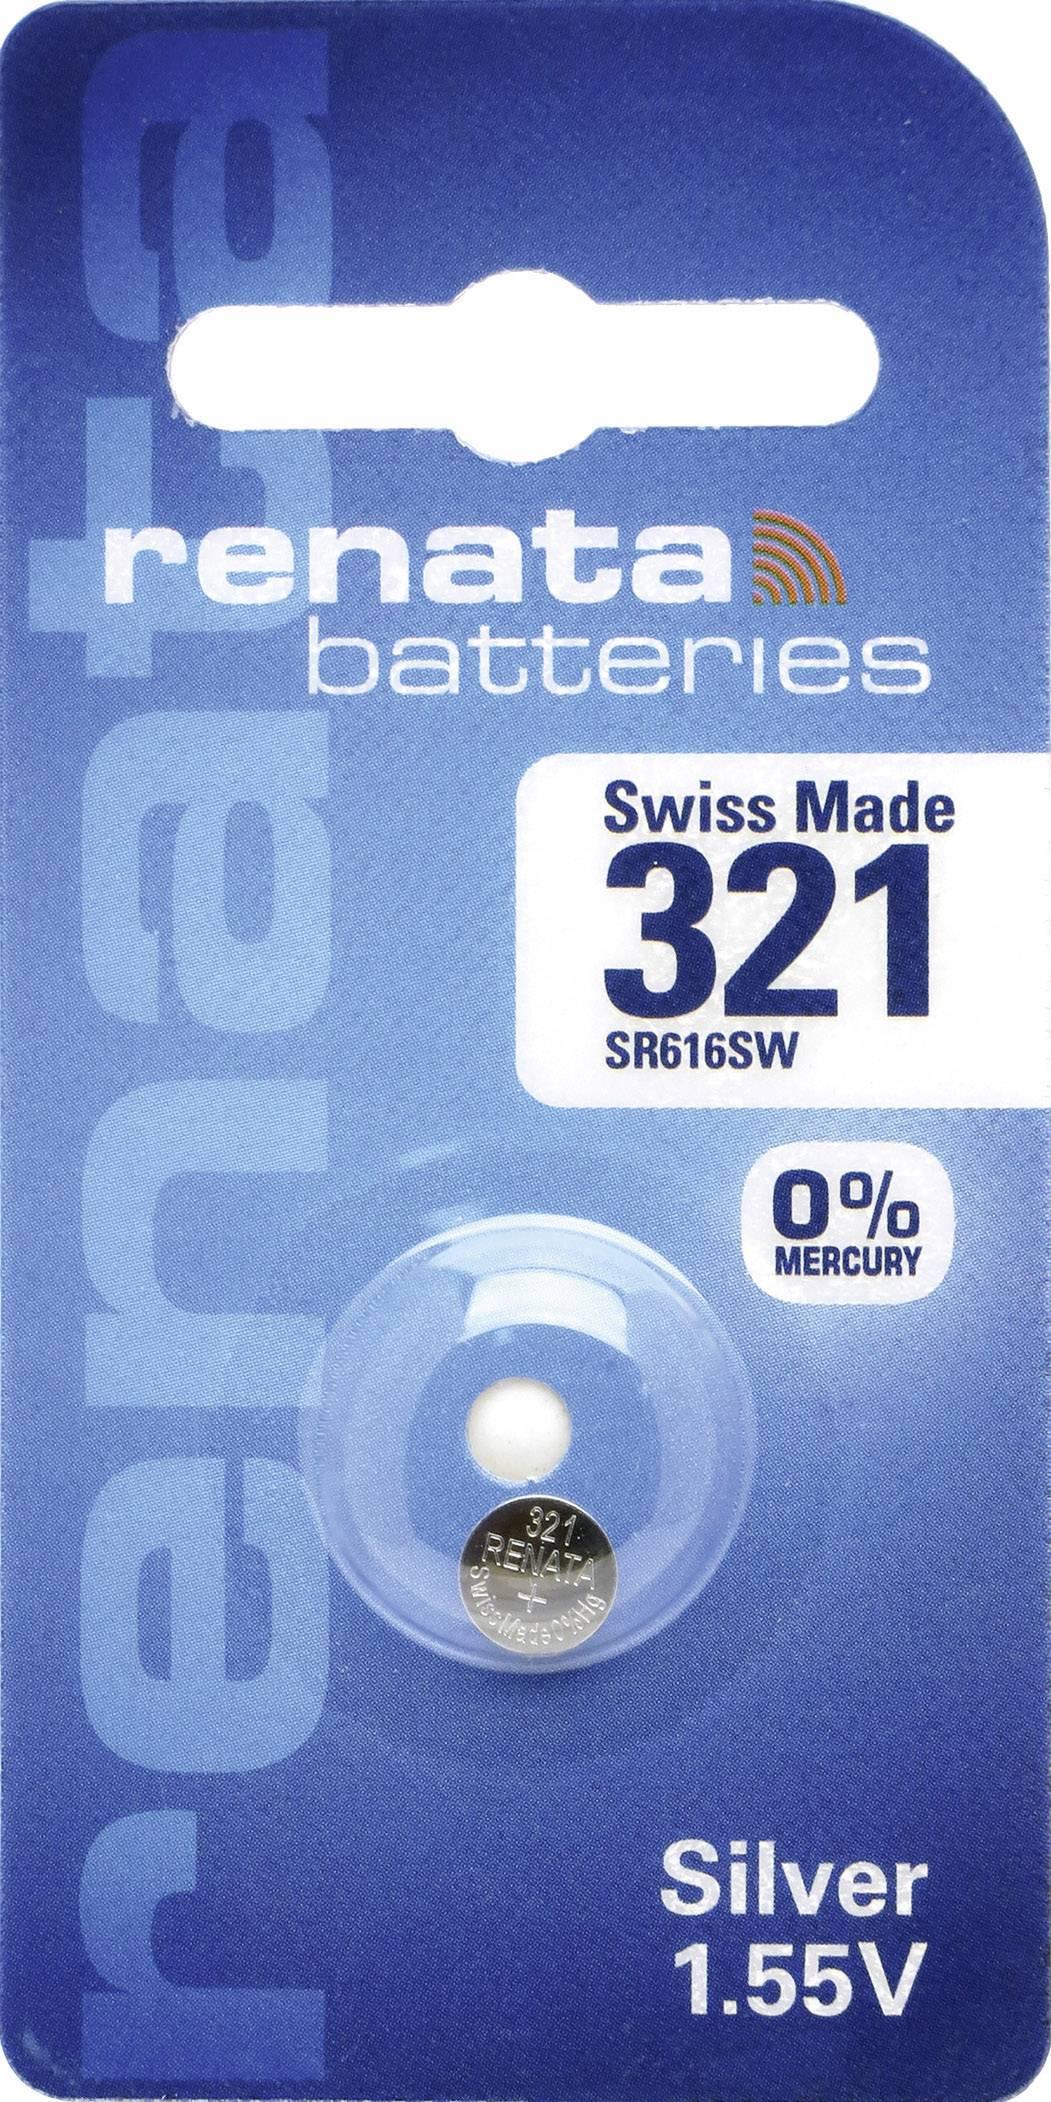 Knoflíková baterie 321, Renata SR65, na bázi oxidu stříbra, 321.CU MF